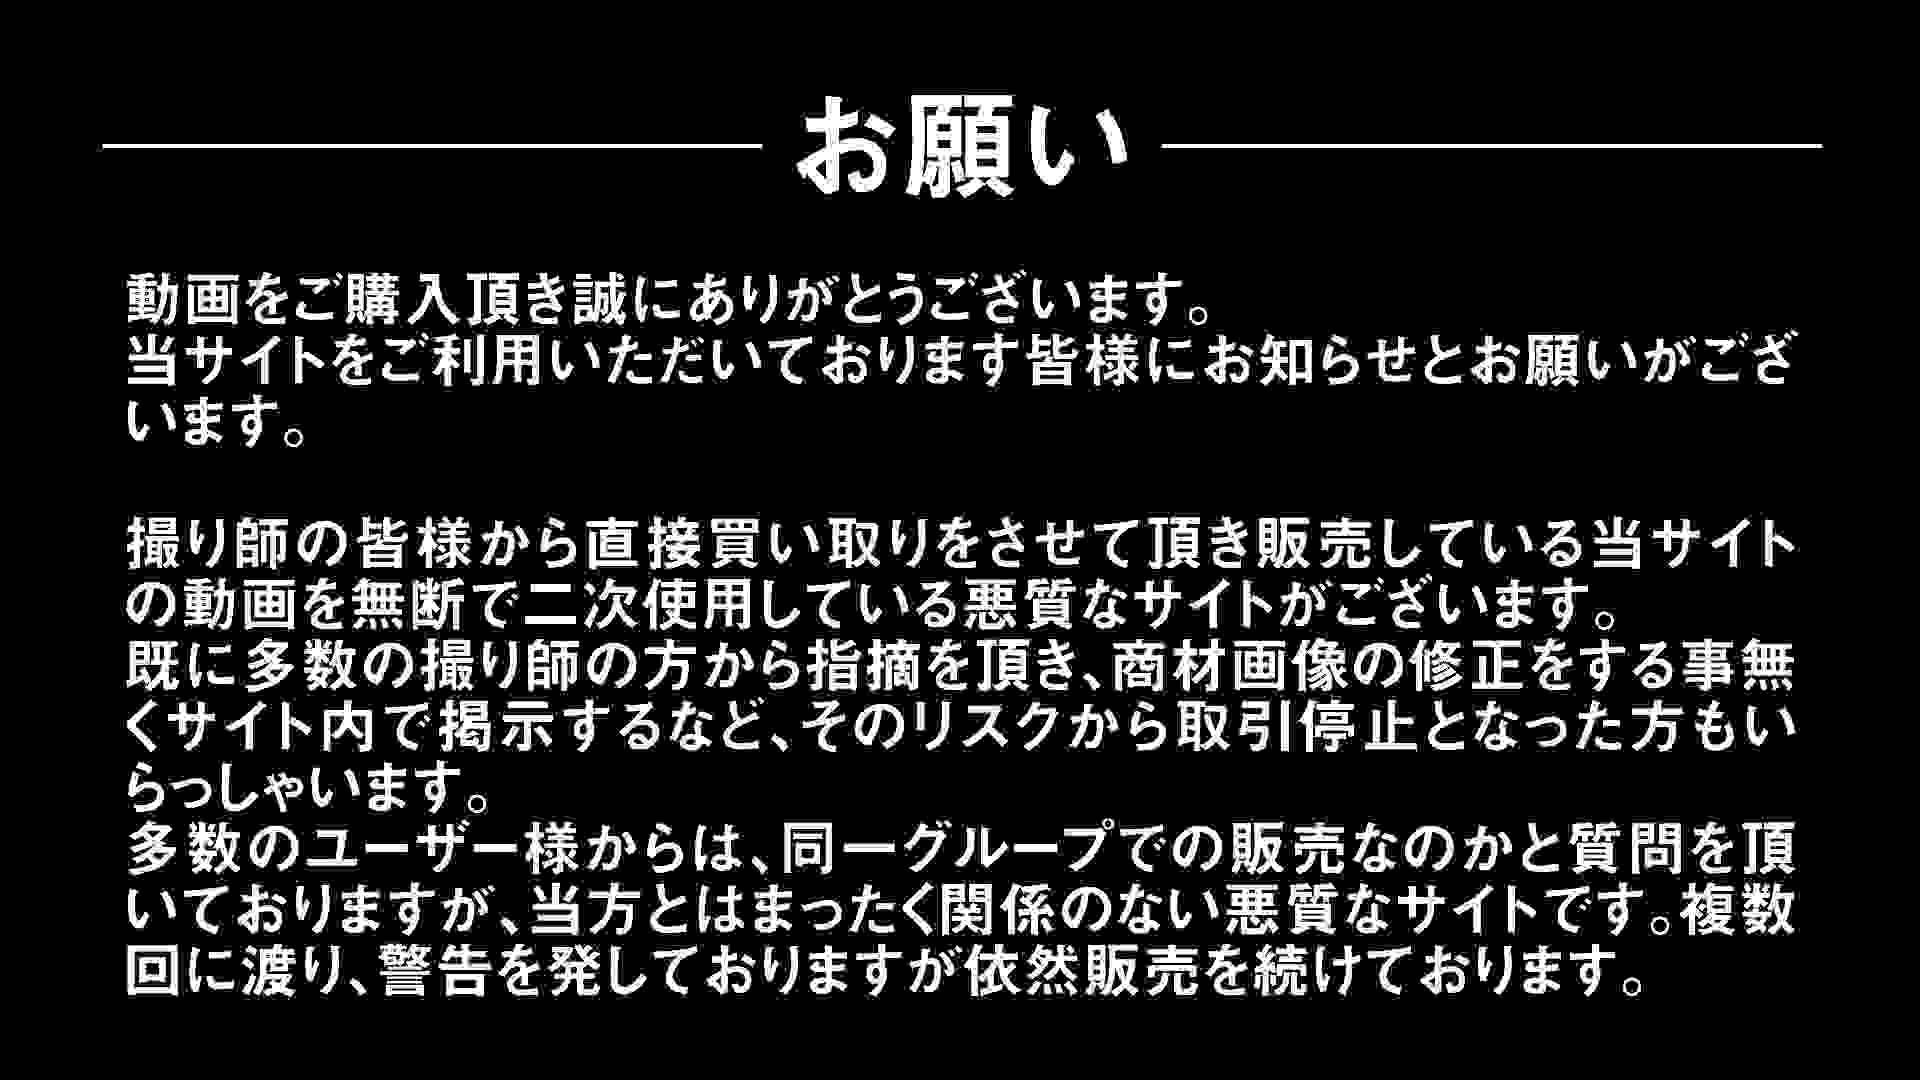 Aquaな露天風呂Vol.297 女体盗撮   OL女体  91連発 4